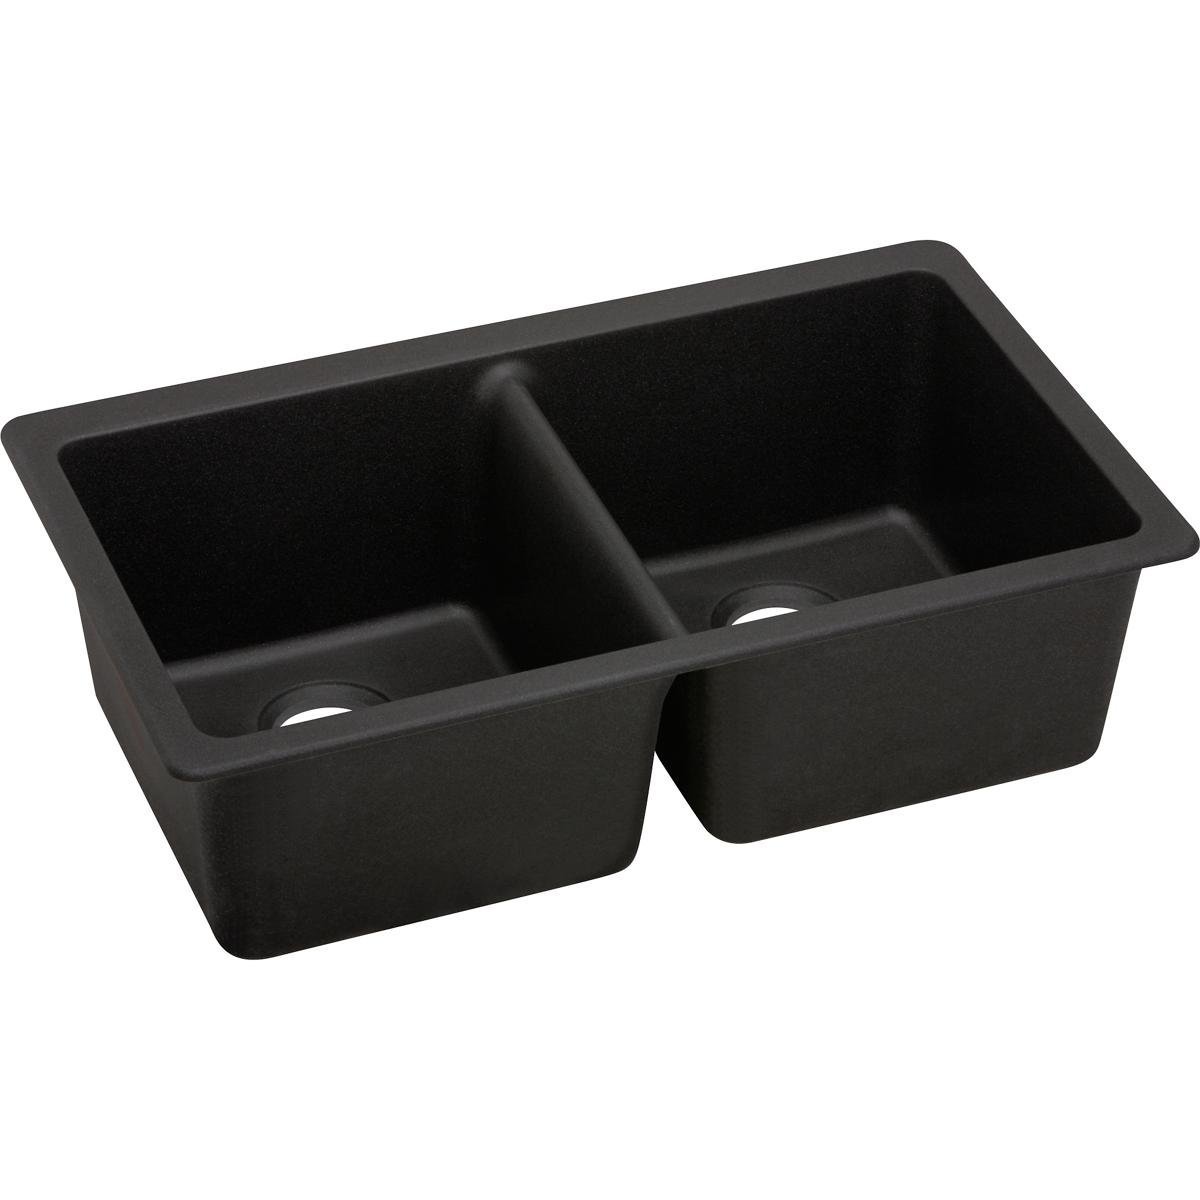 Elkay Quartz Luxe ELXU3322CA0 Caviar Equal Double Bowl Undermount Sink